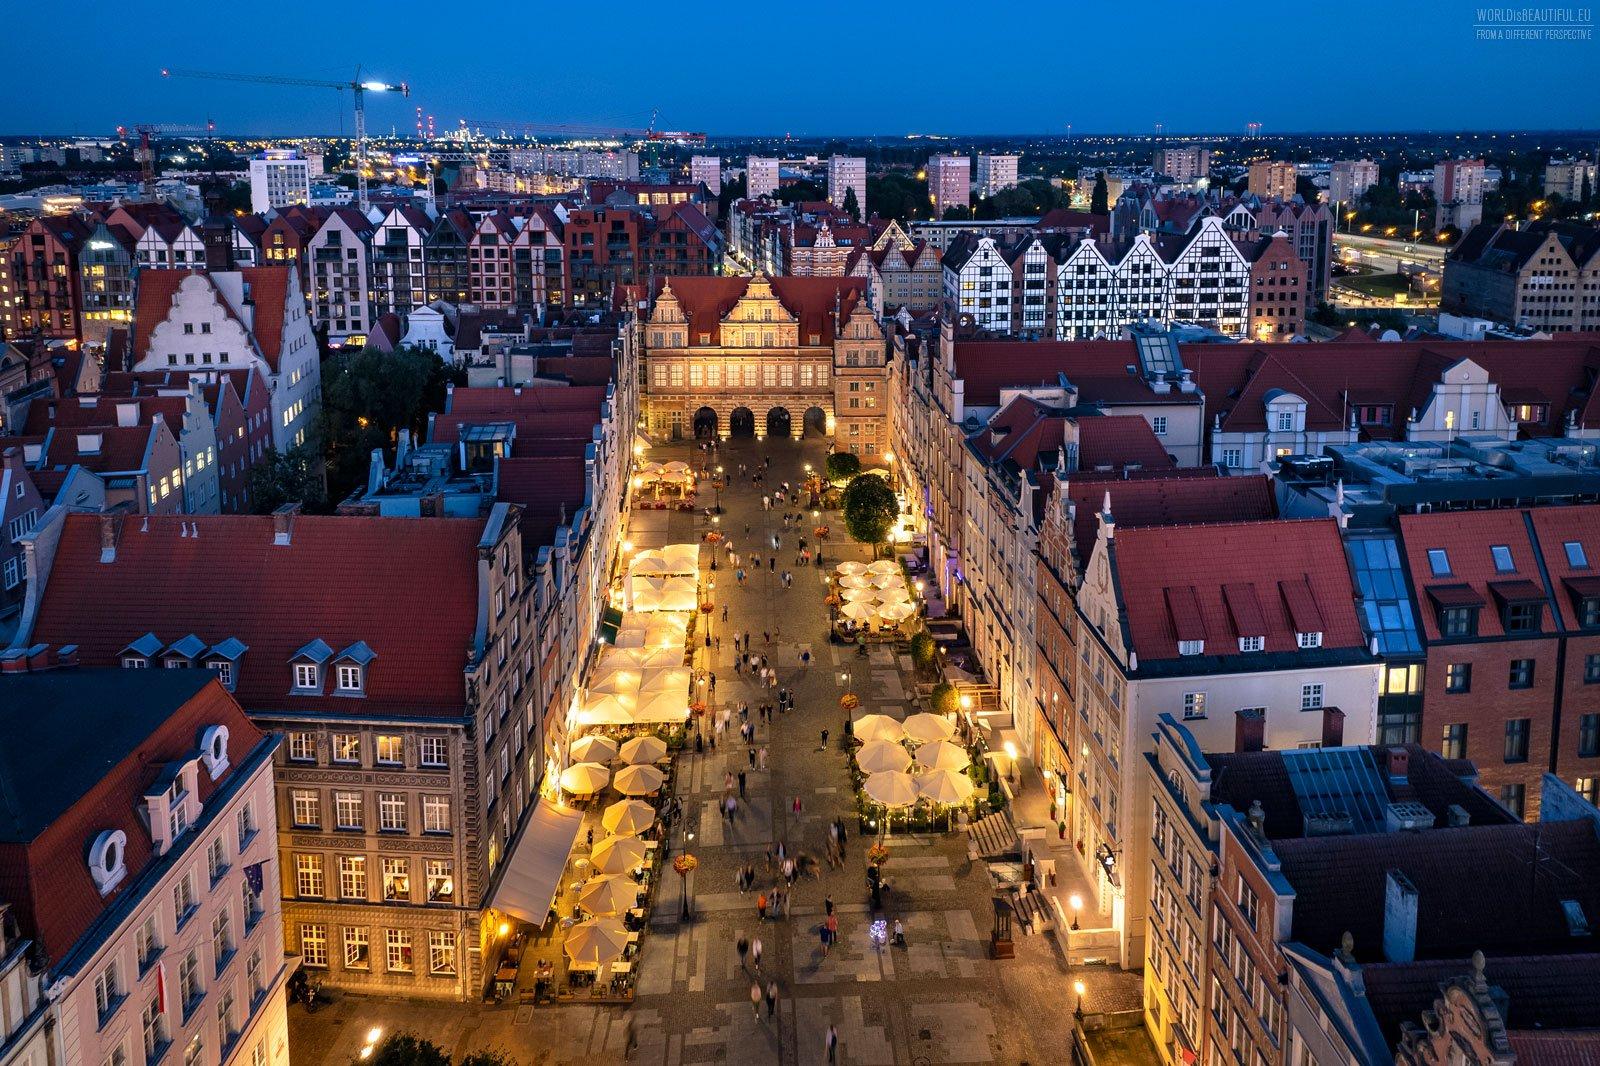 Gdansk city center at night